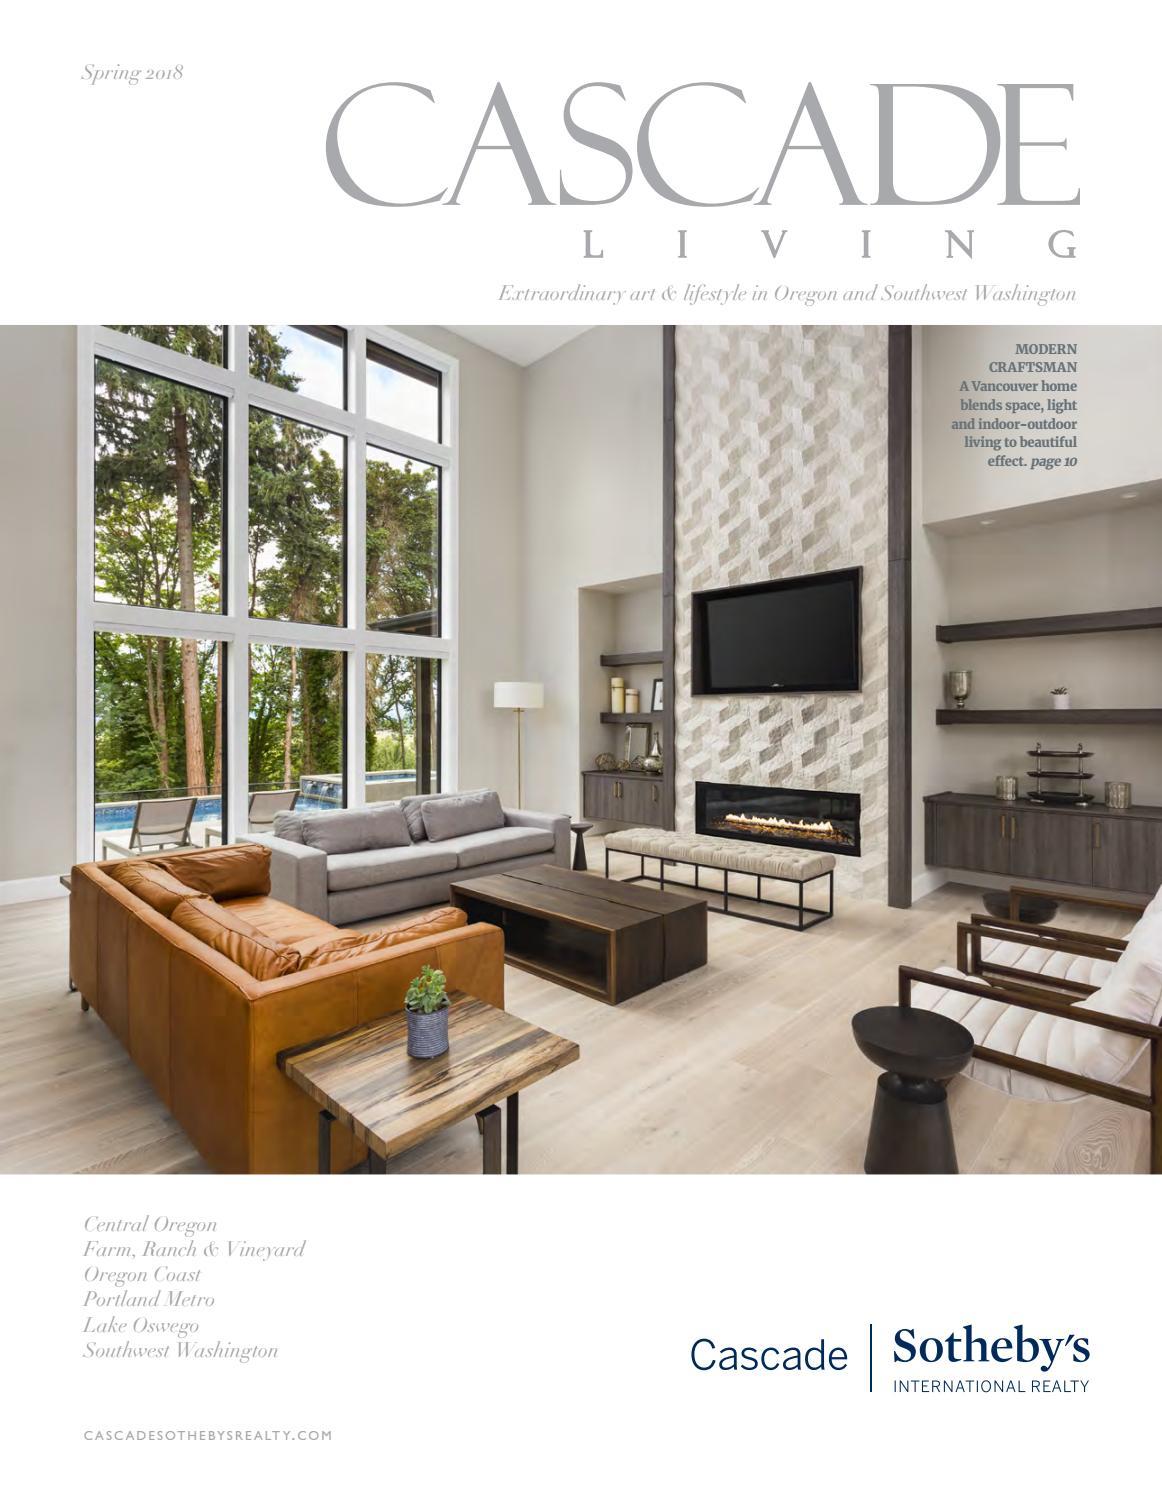 Cascade living spring 2018 by Cascade Sothebyu0027s